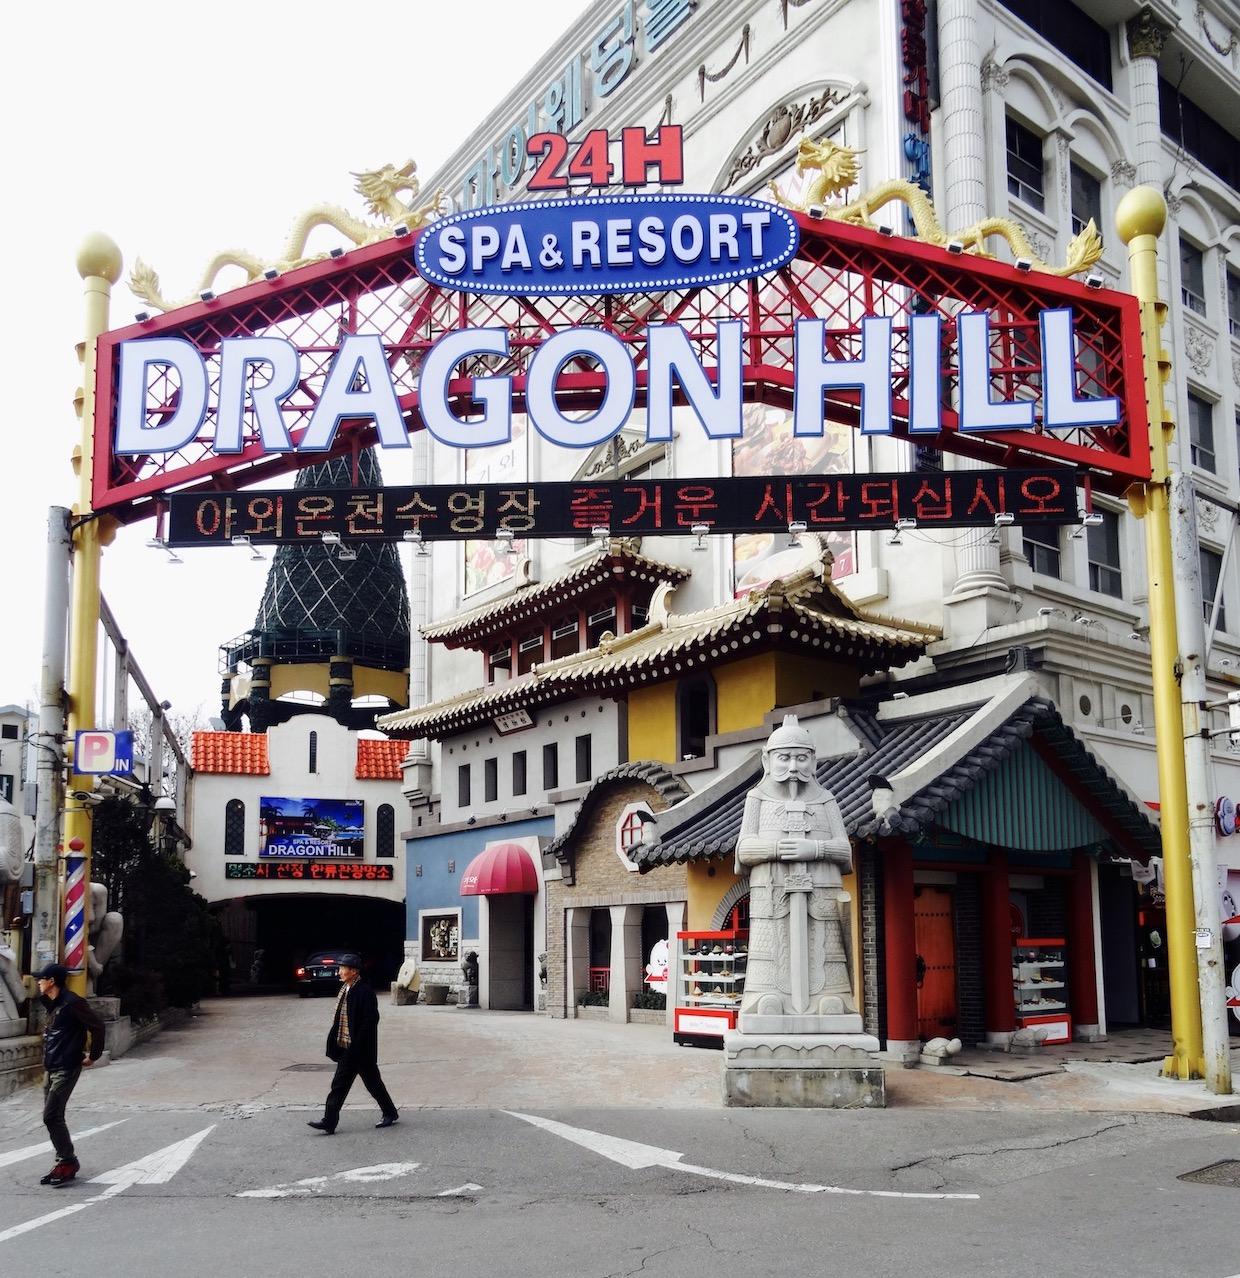 Dragon Hill Spa Seoul.